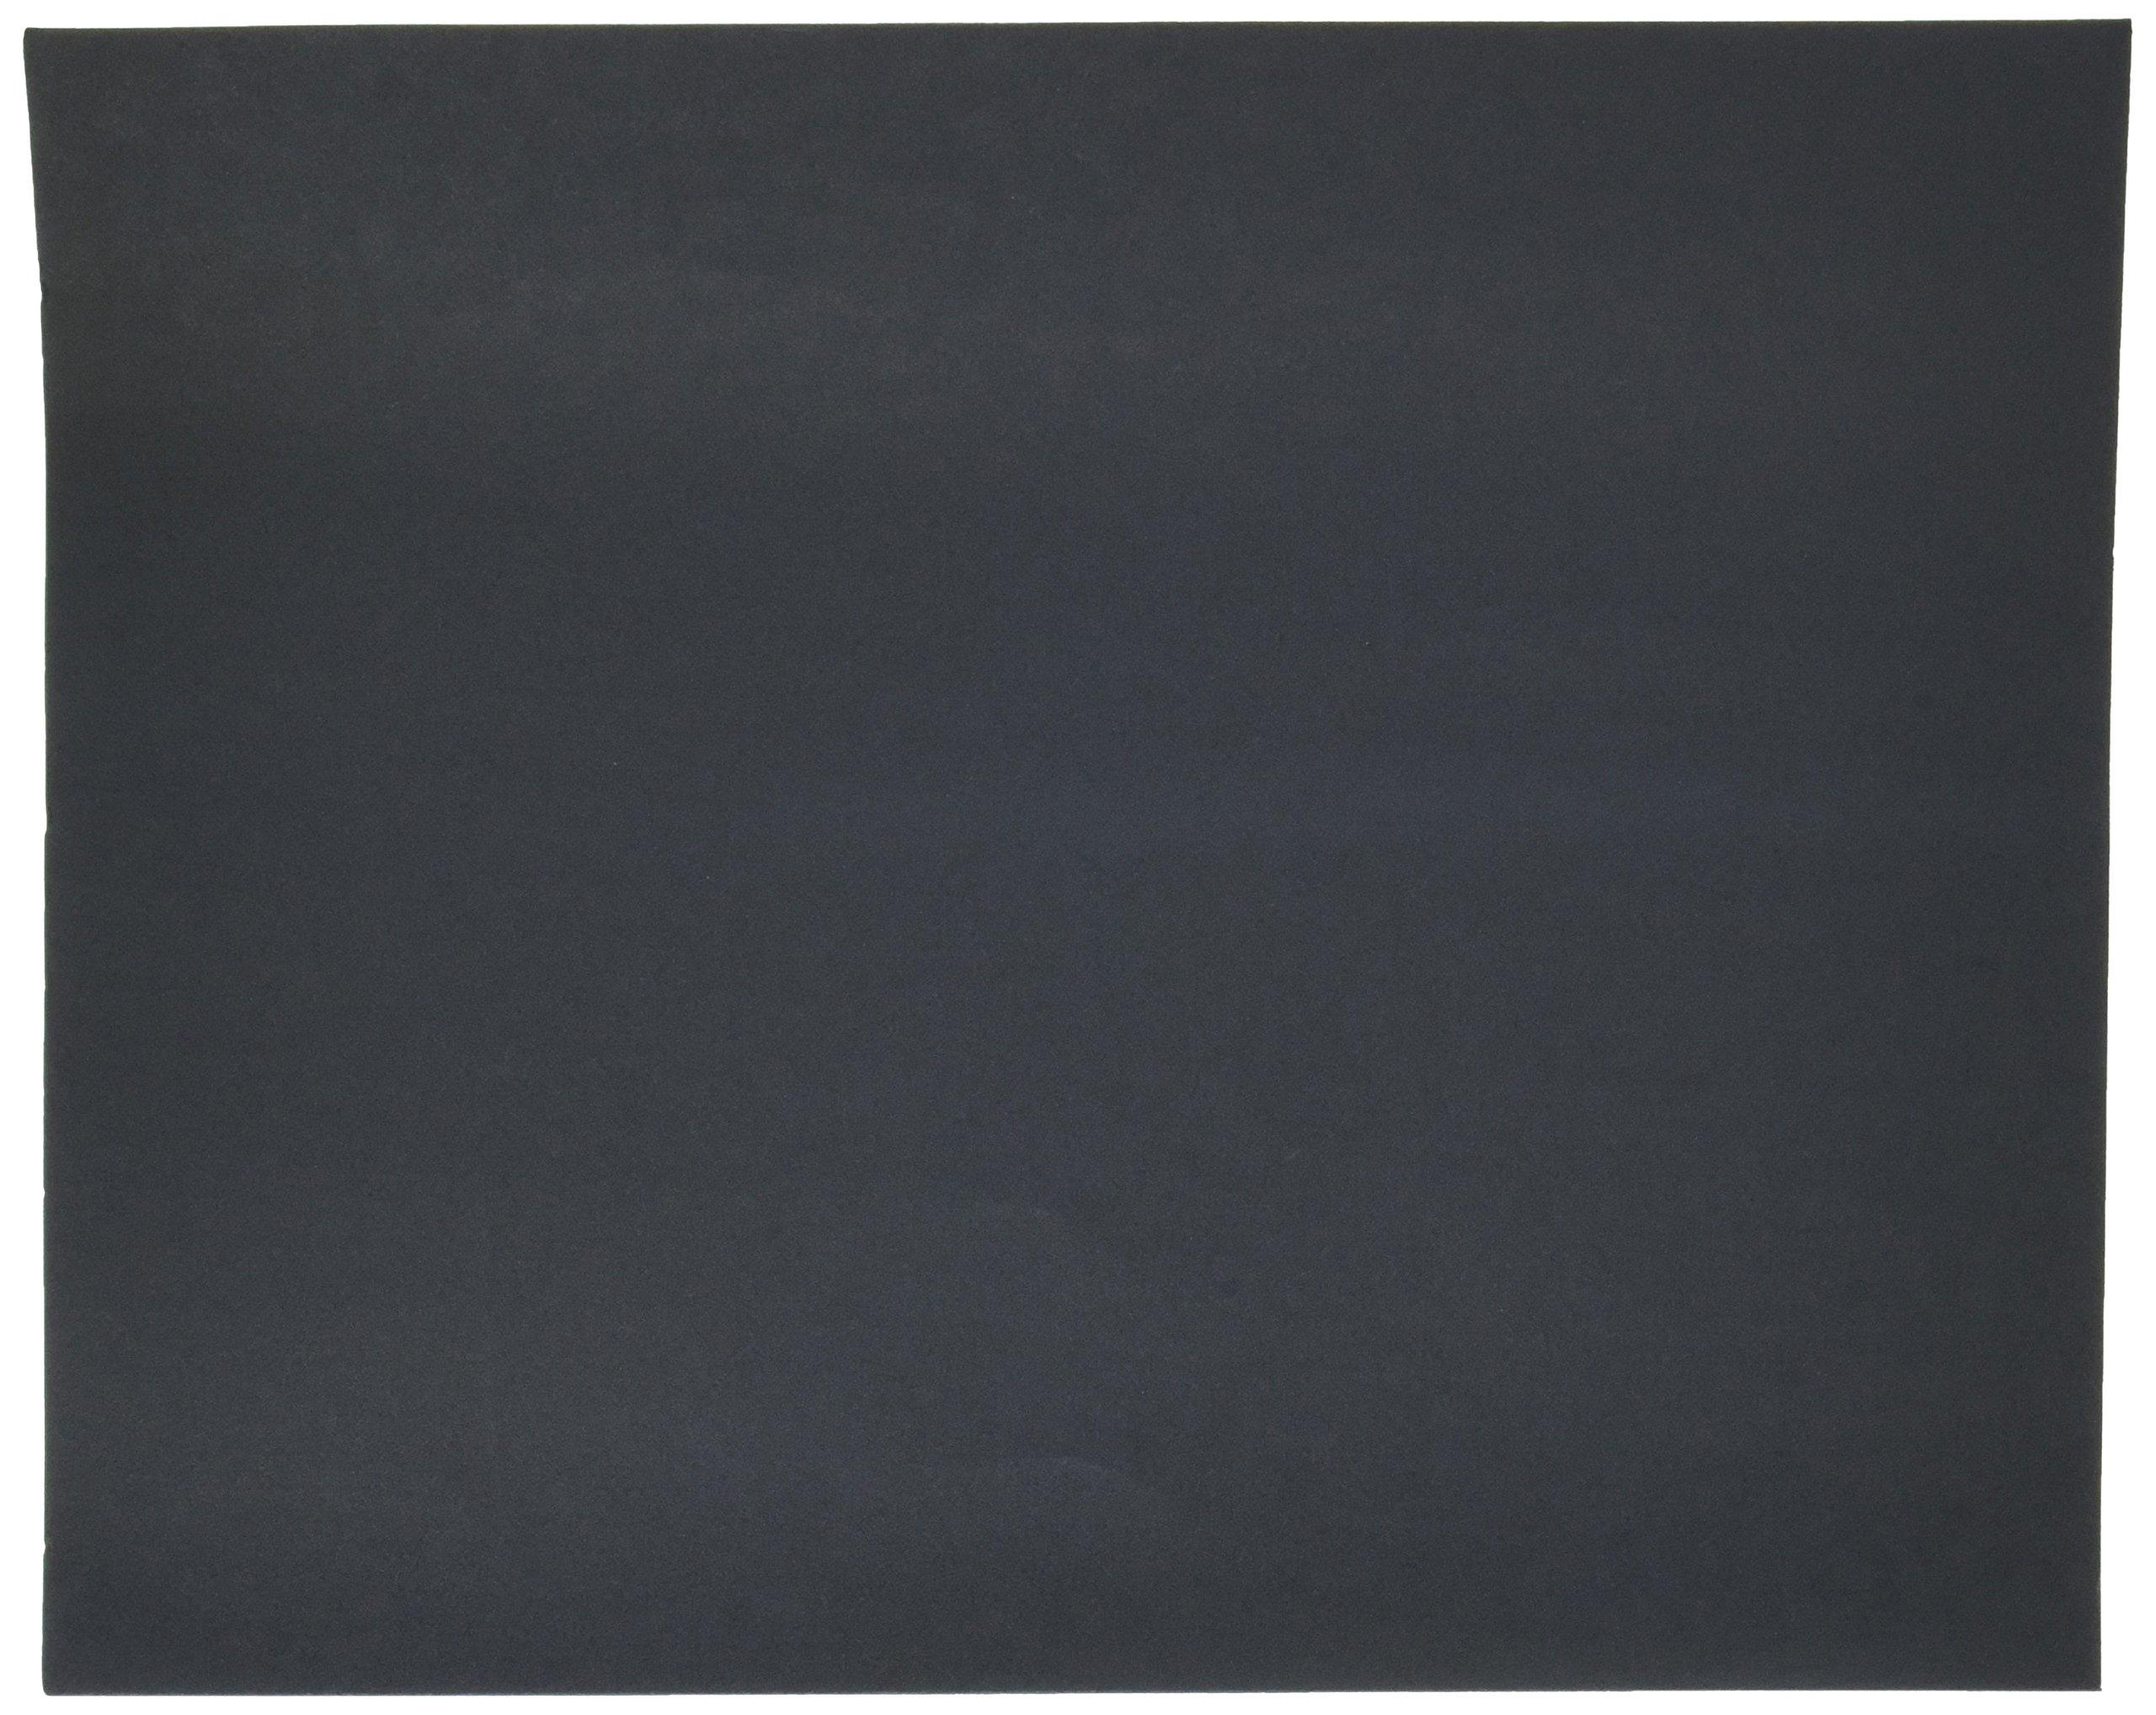 Norton T414 Blue-Bak Abrasive Sheet, Paper Backing, Silicon Carbide, Waterproof, Grit 320  (Pack of 10)